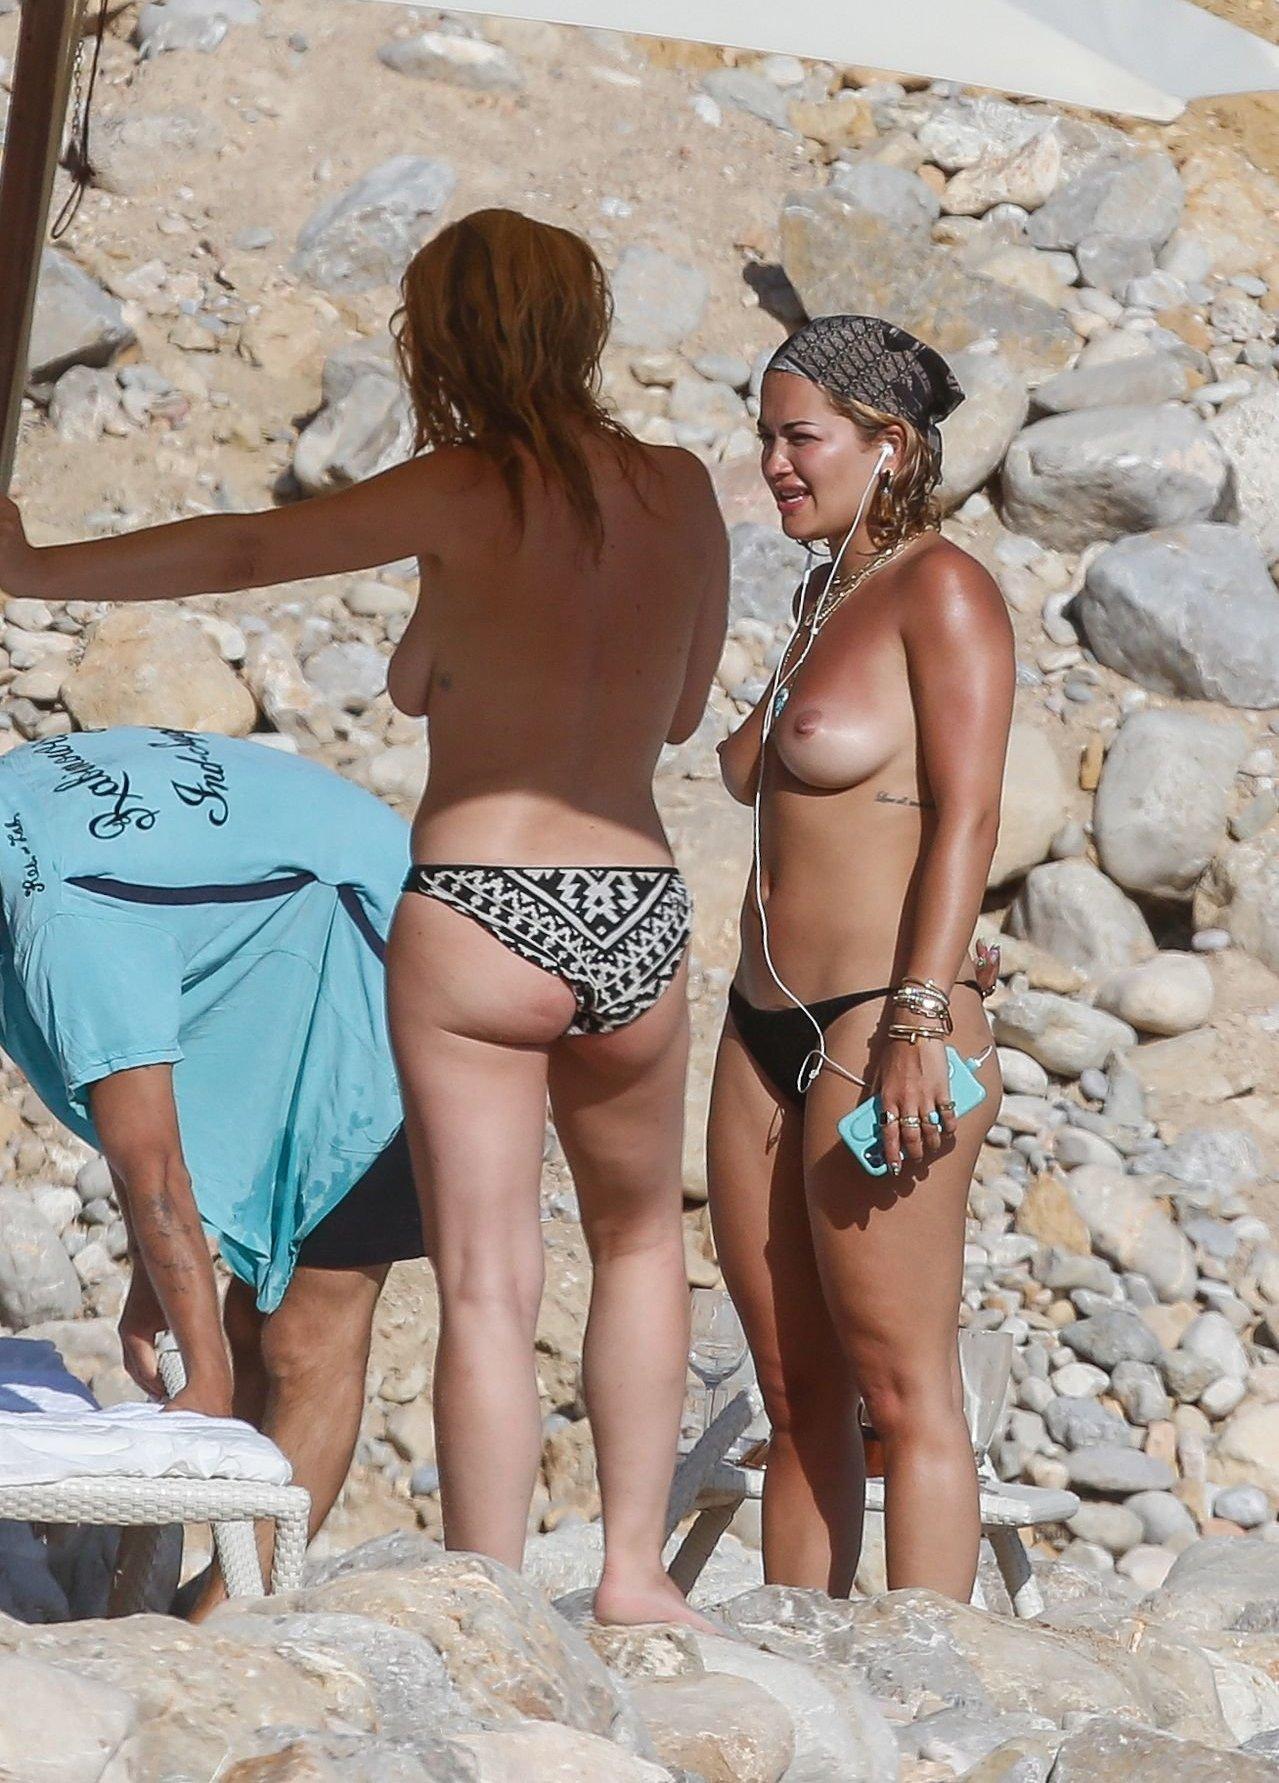 Rita Ora Instagram Nude Leaks 0014